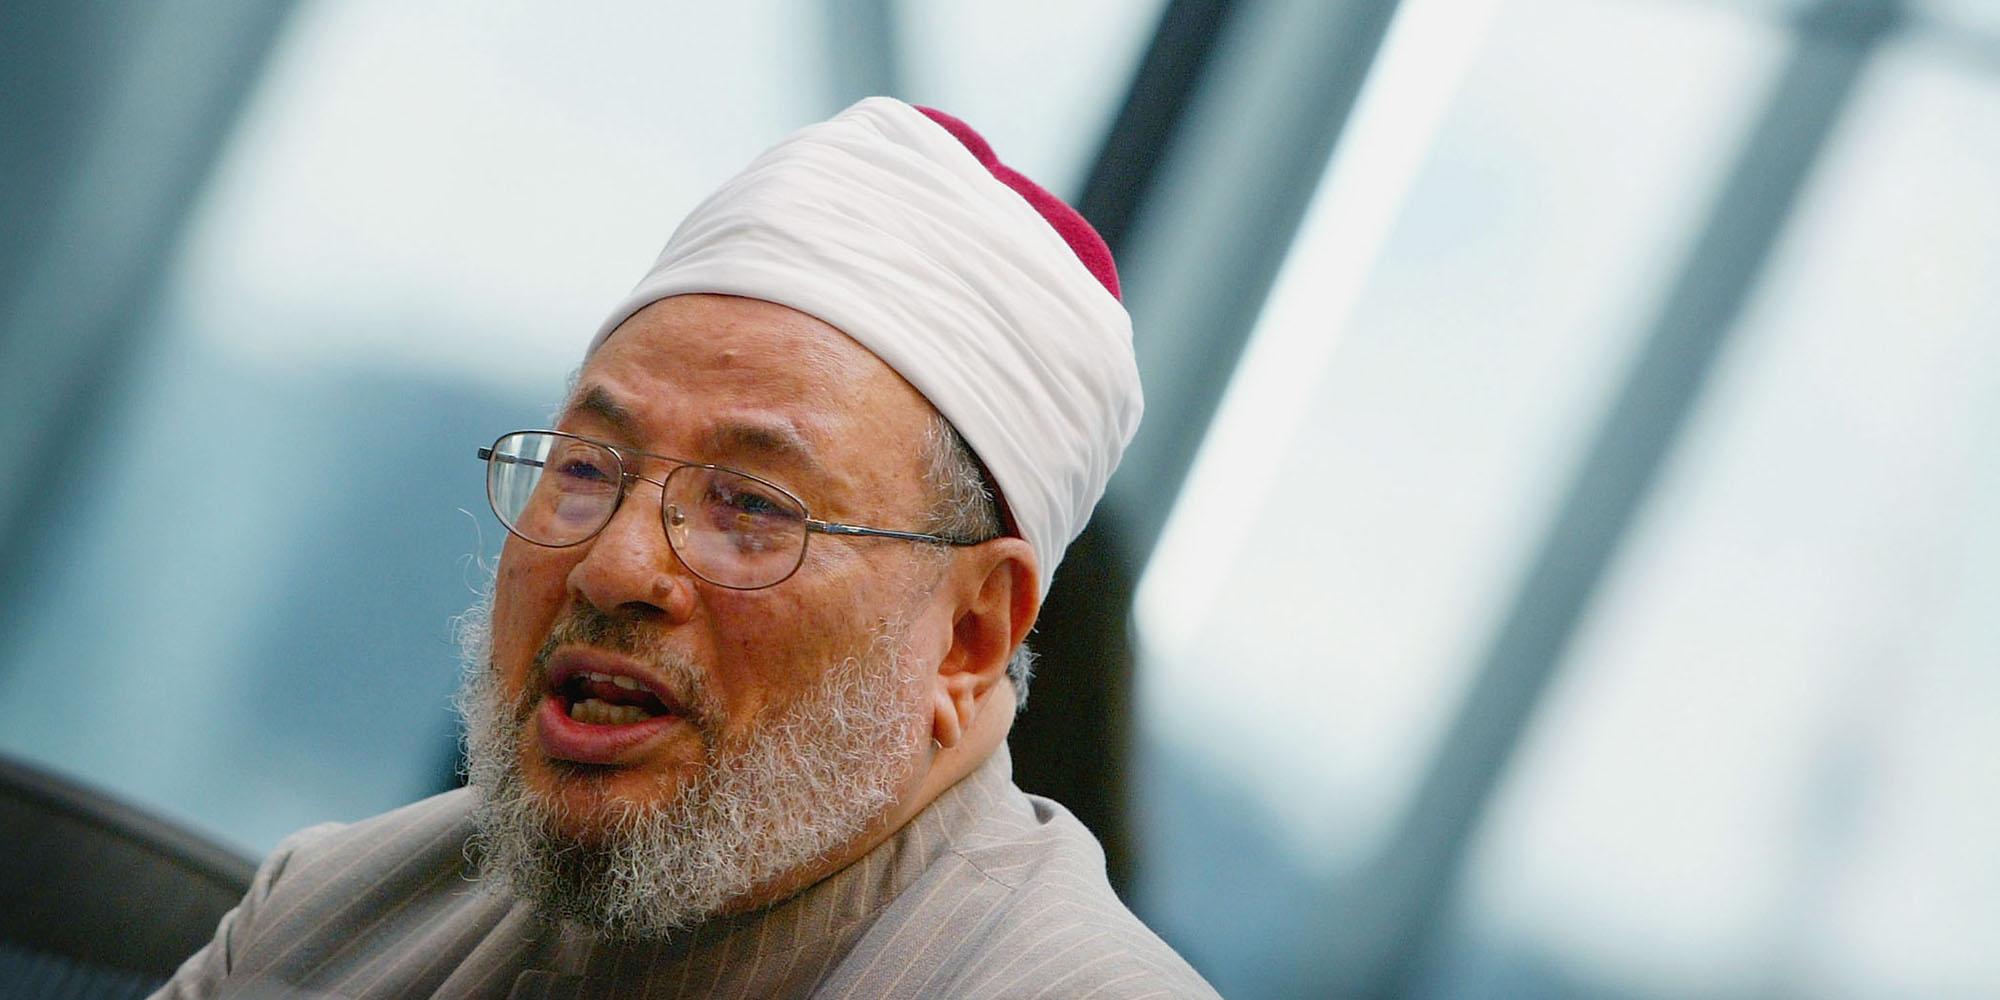 Mohammed Abed Al Jabri Pdf